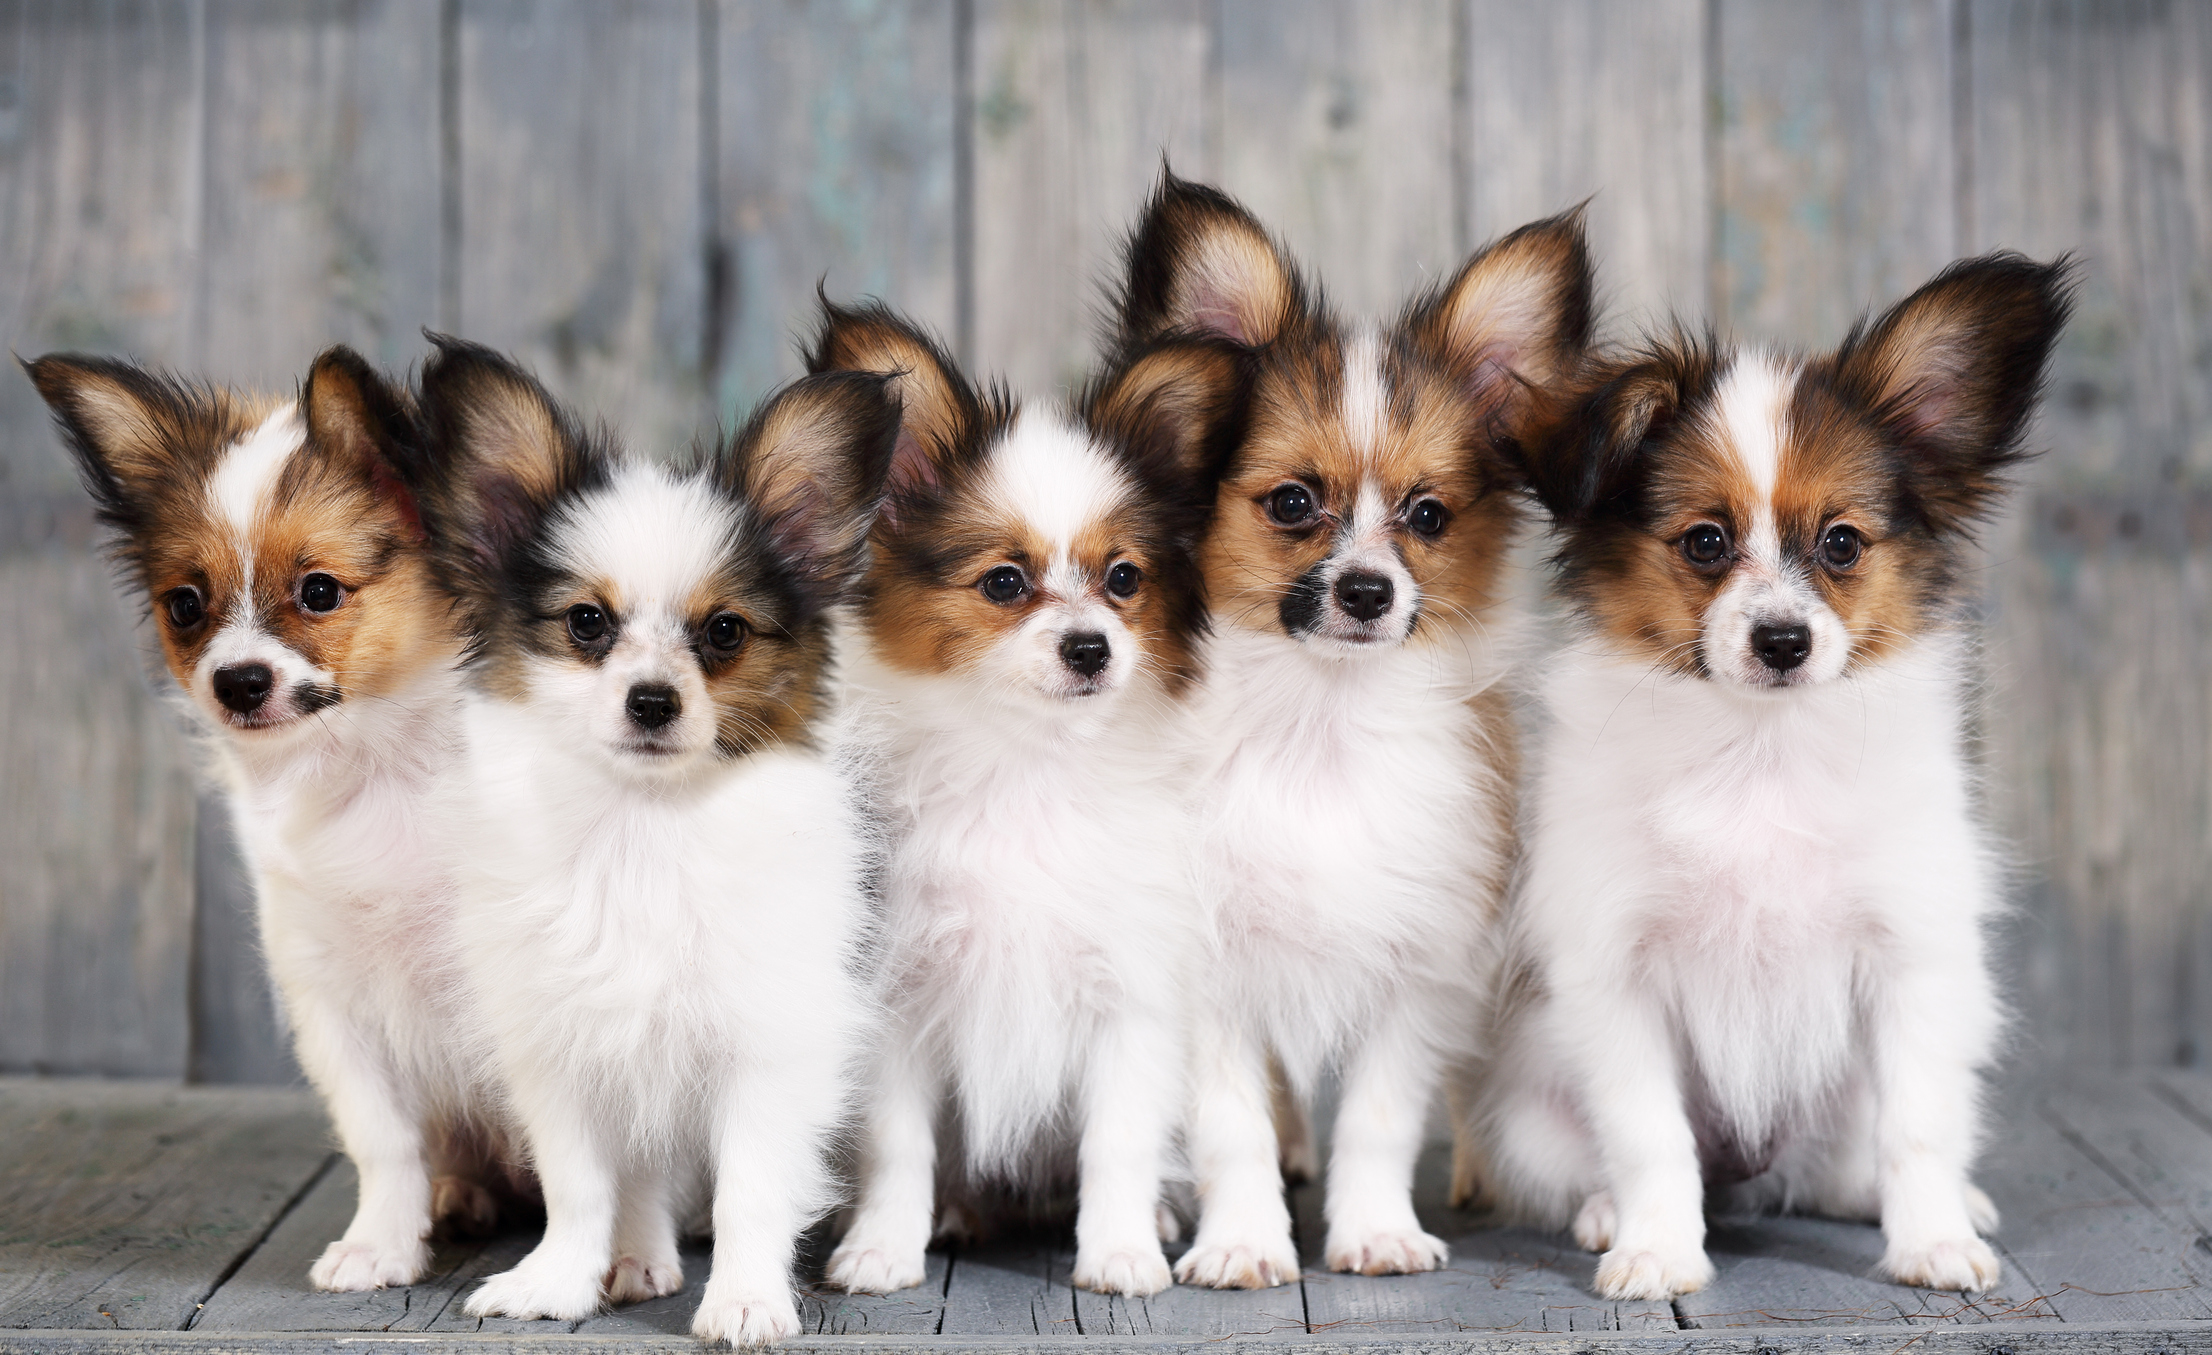 Papillon Dog Breed Characteristics and Personality